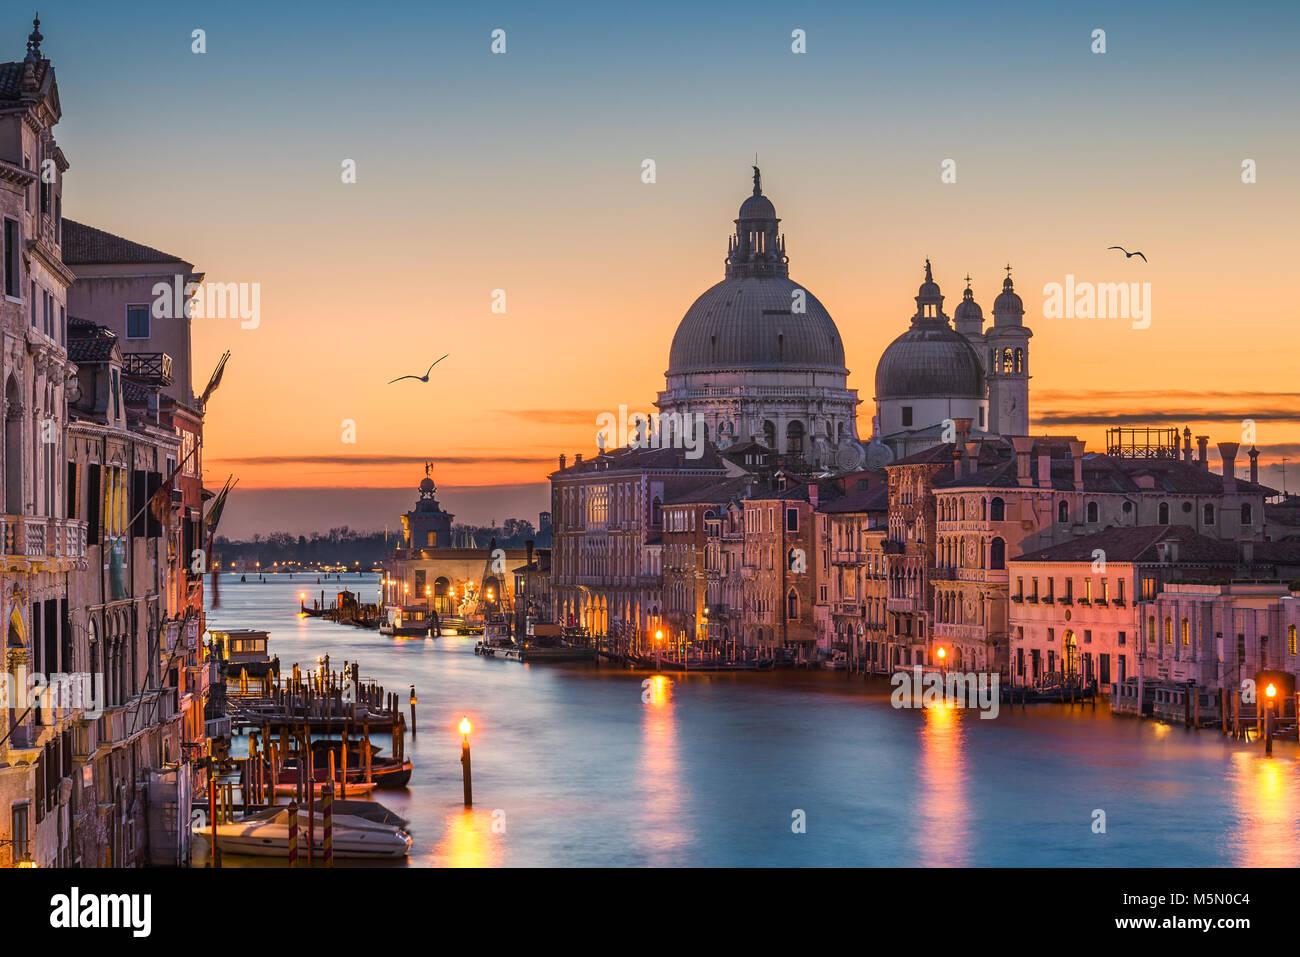 Grand Canal de nuit avec Basilique Santa Maria della Salute, Venise, Italie Photo Stock